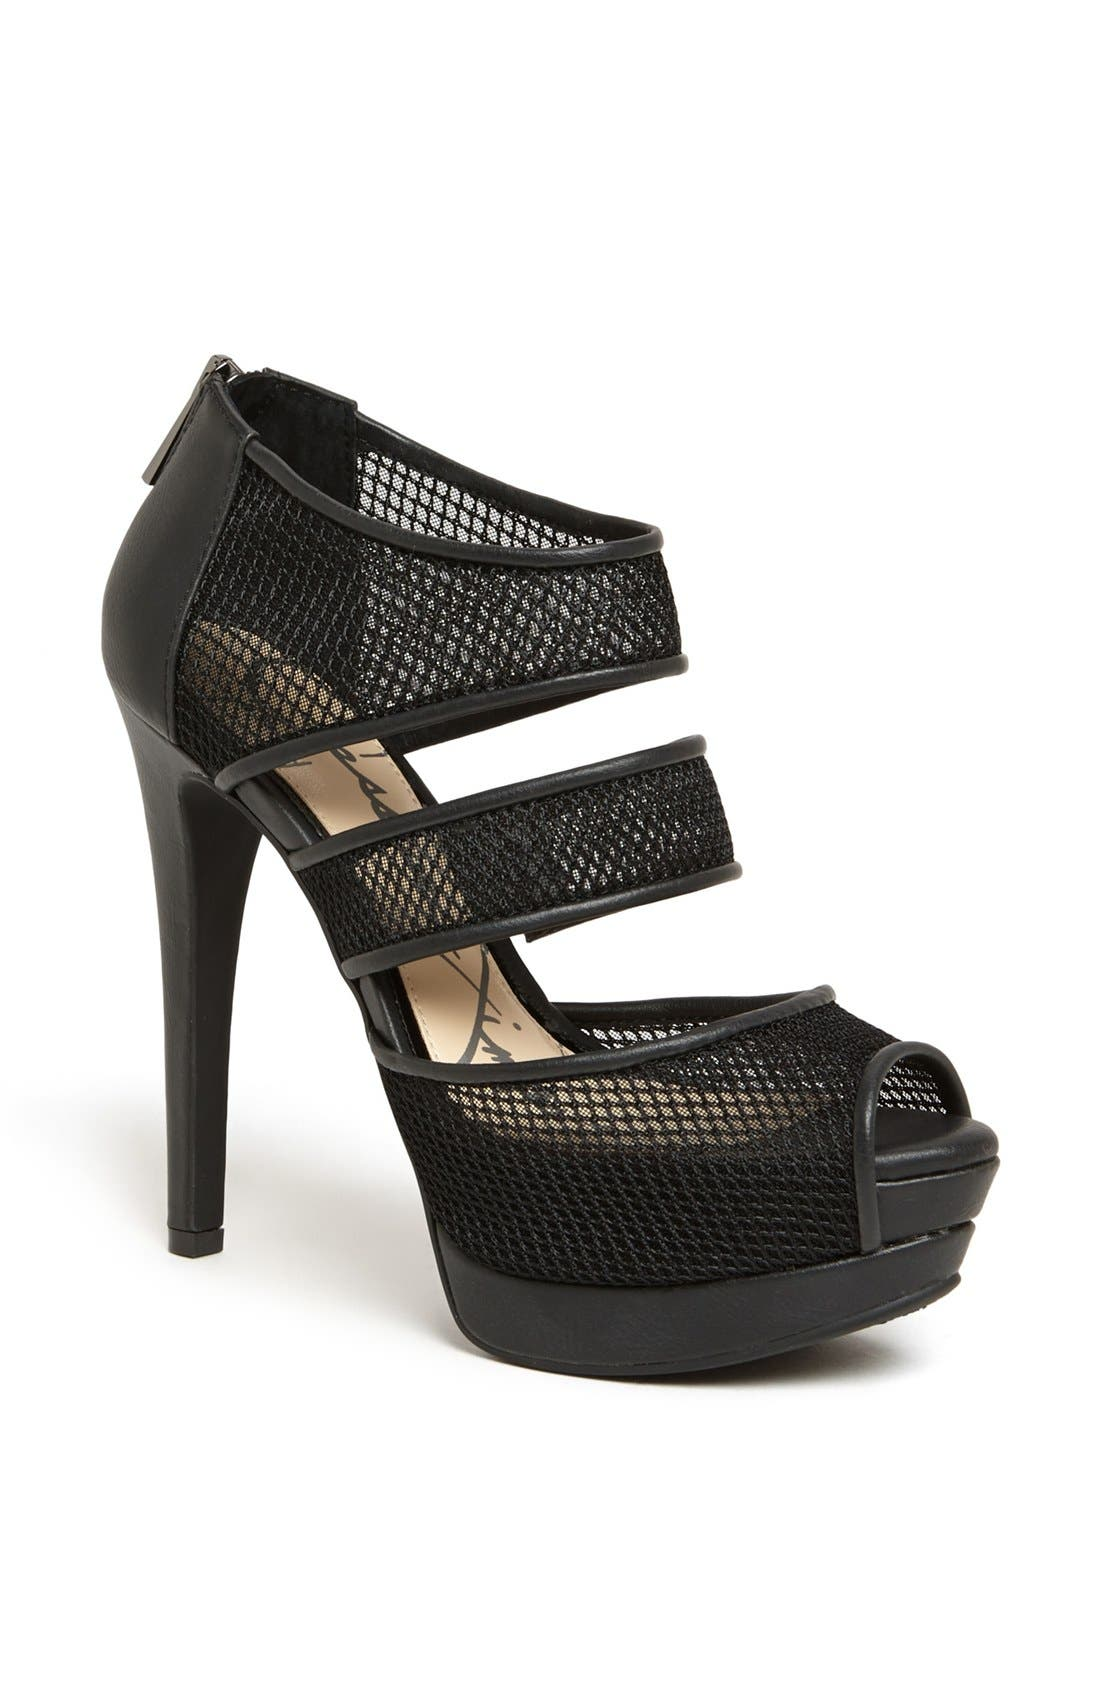 Alternate Image 1 Selected - Jessica Simpson 'Smyth' Sandal